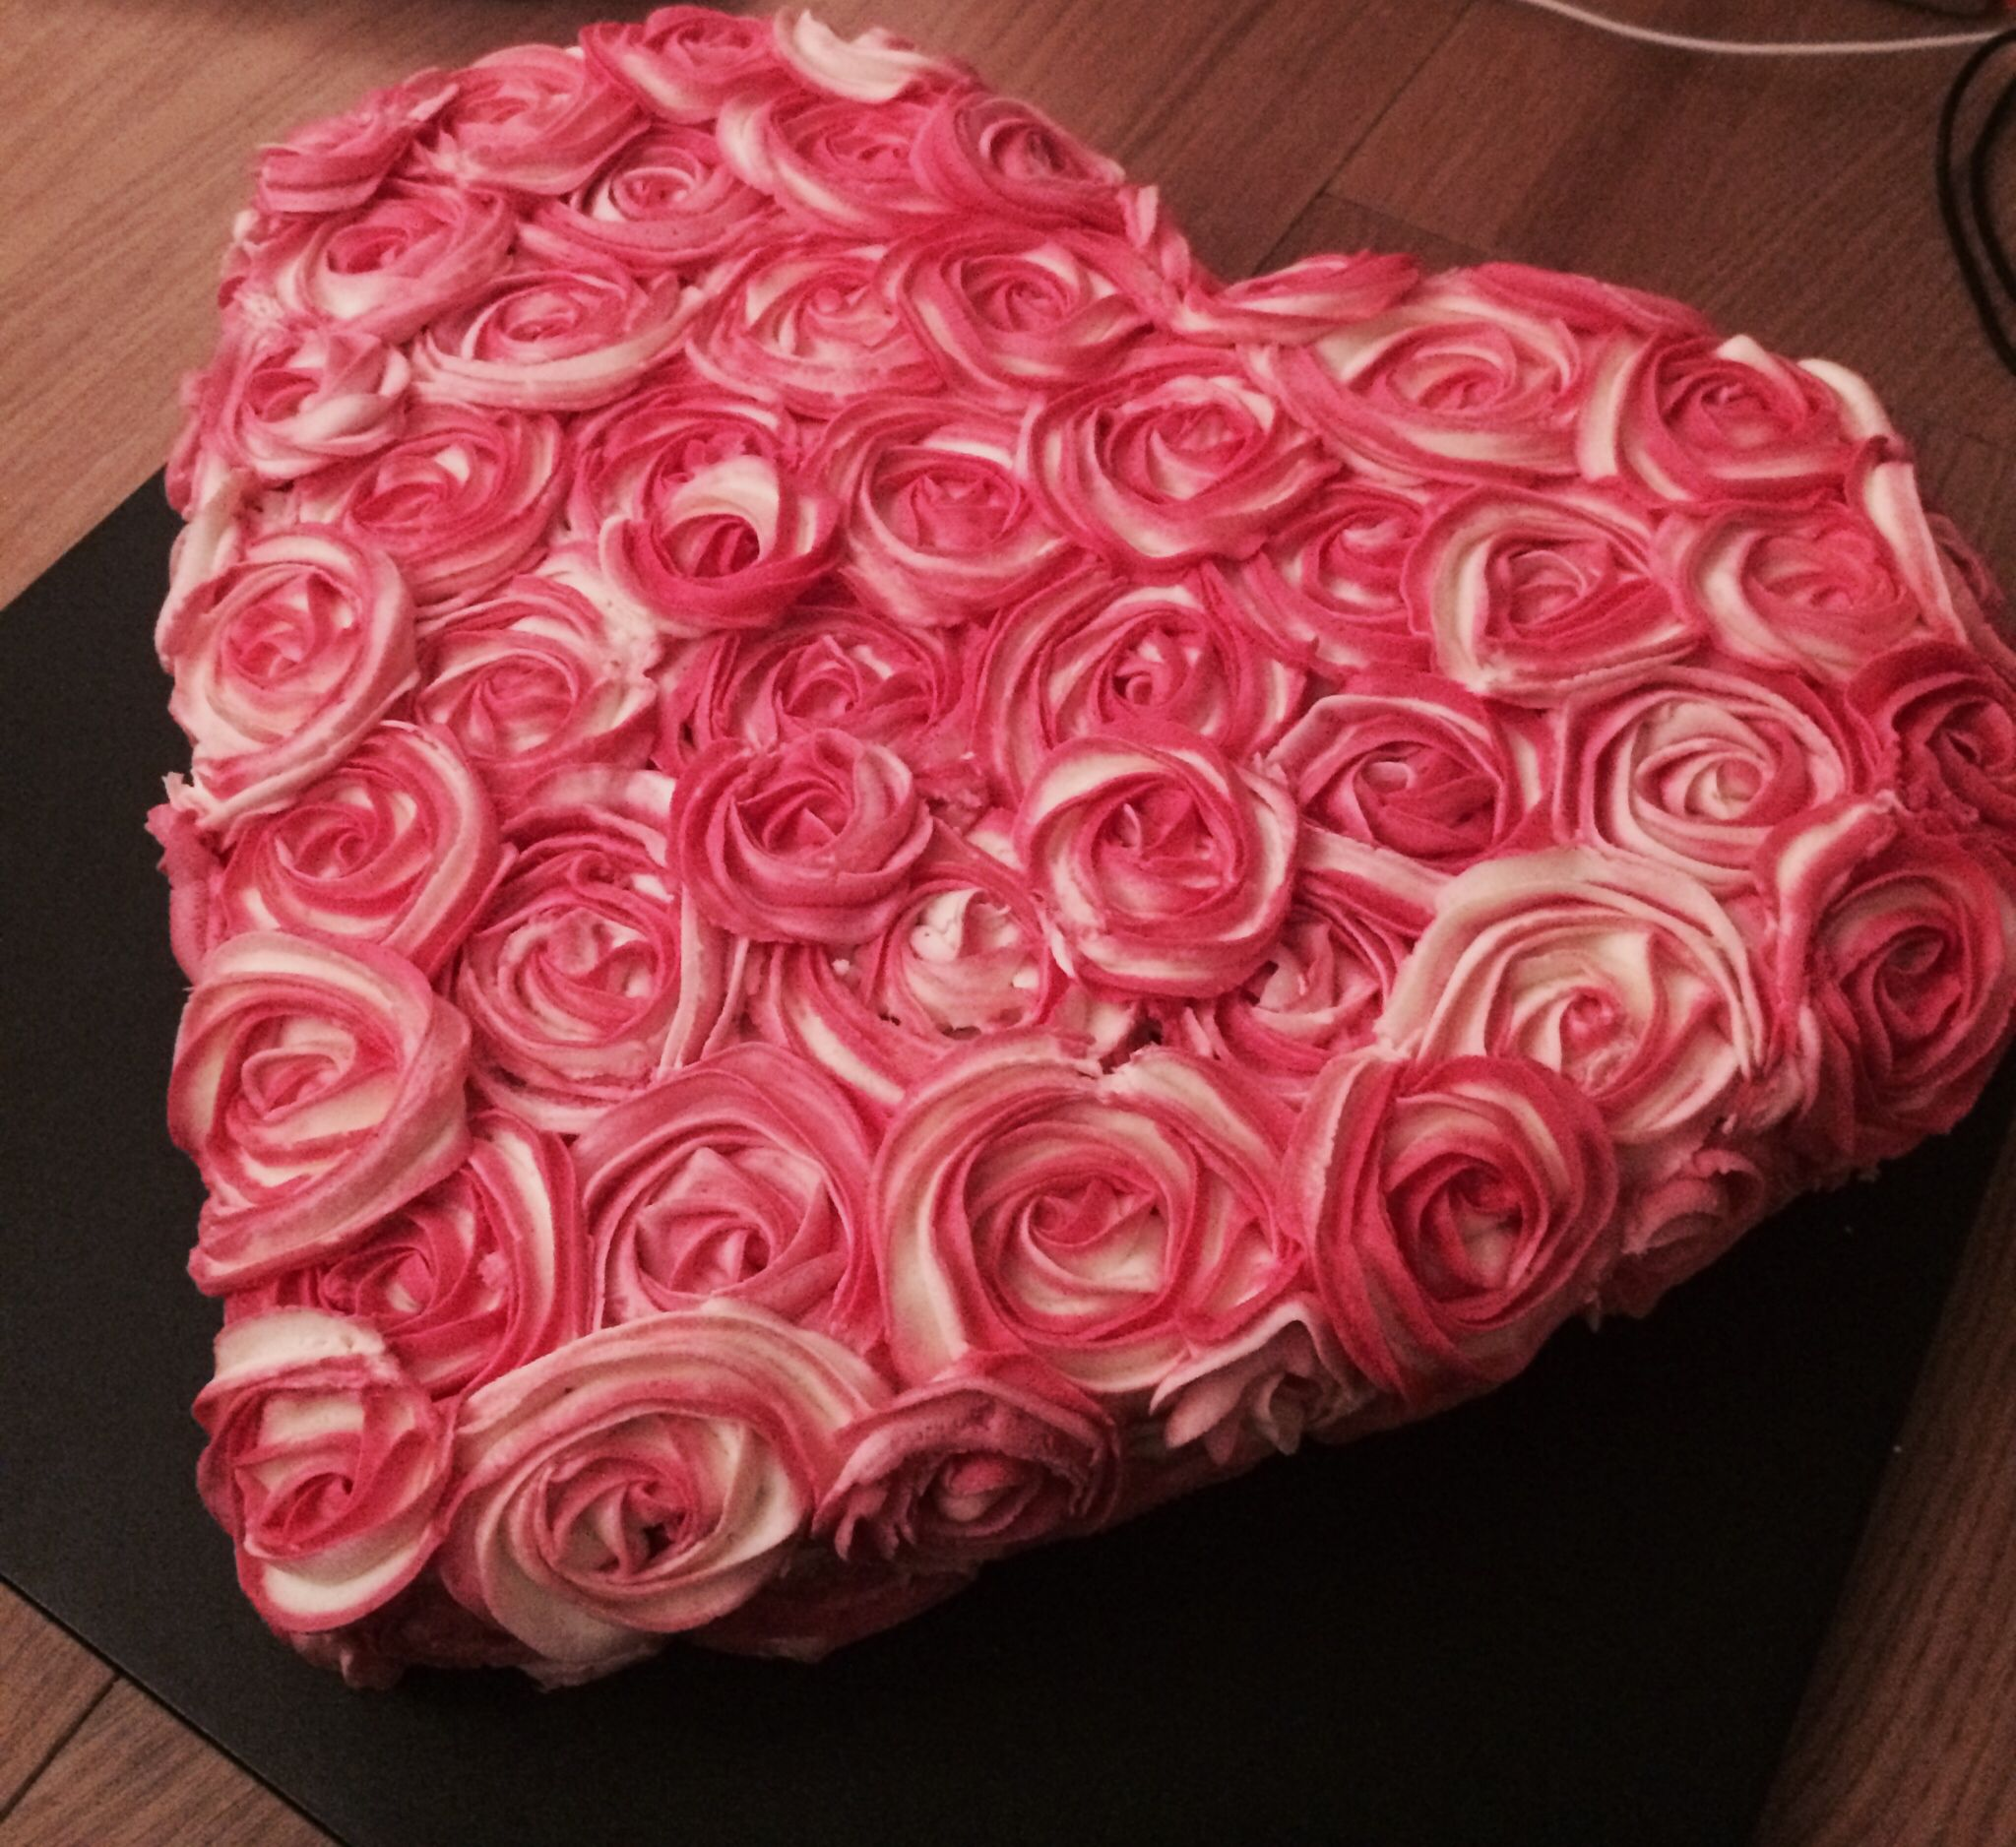 Rose Swirl Cake Design : #Rose Swirl Cake #engagement Cake Decorating Pinterest